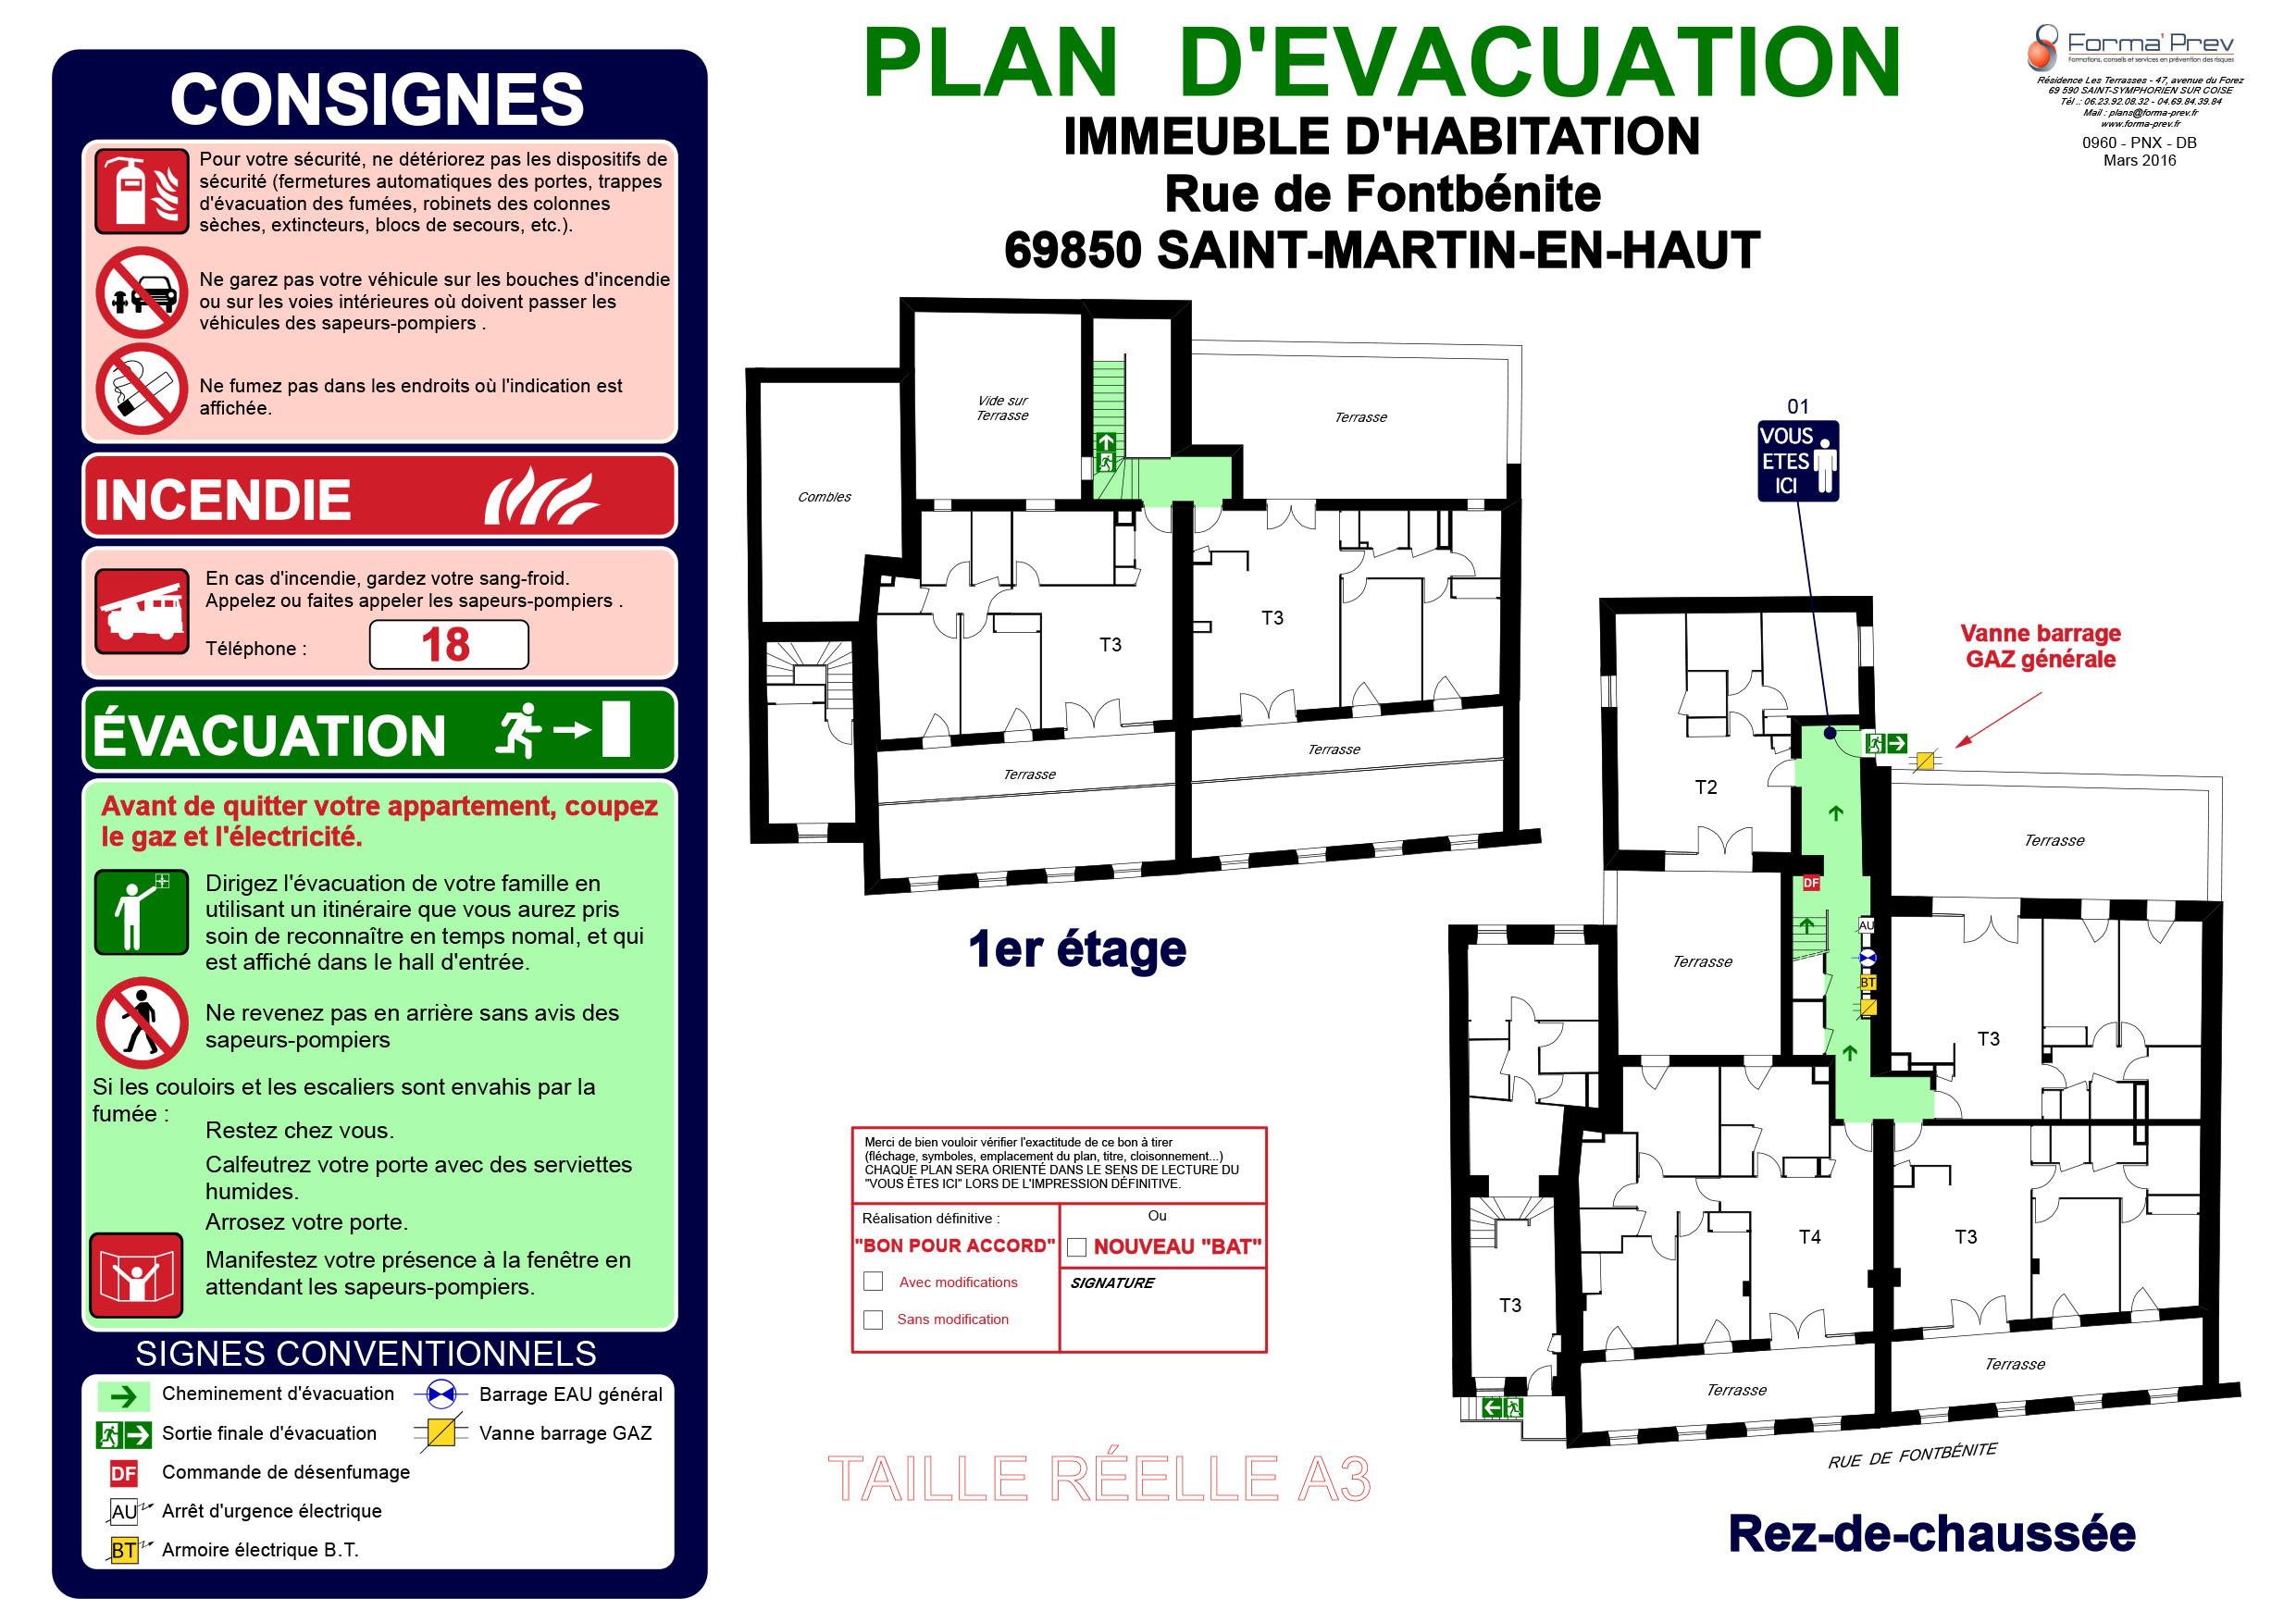 Plan d'évacuation 1